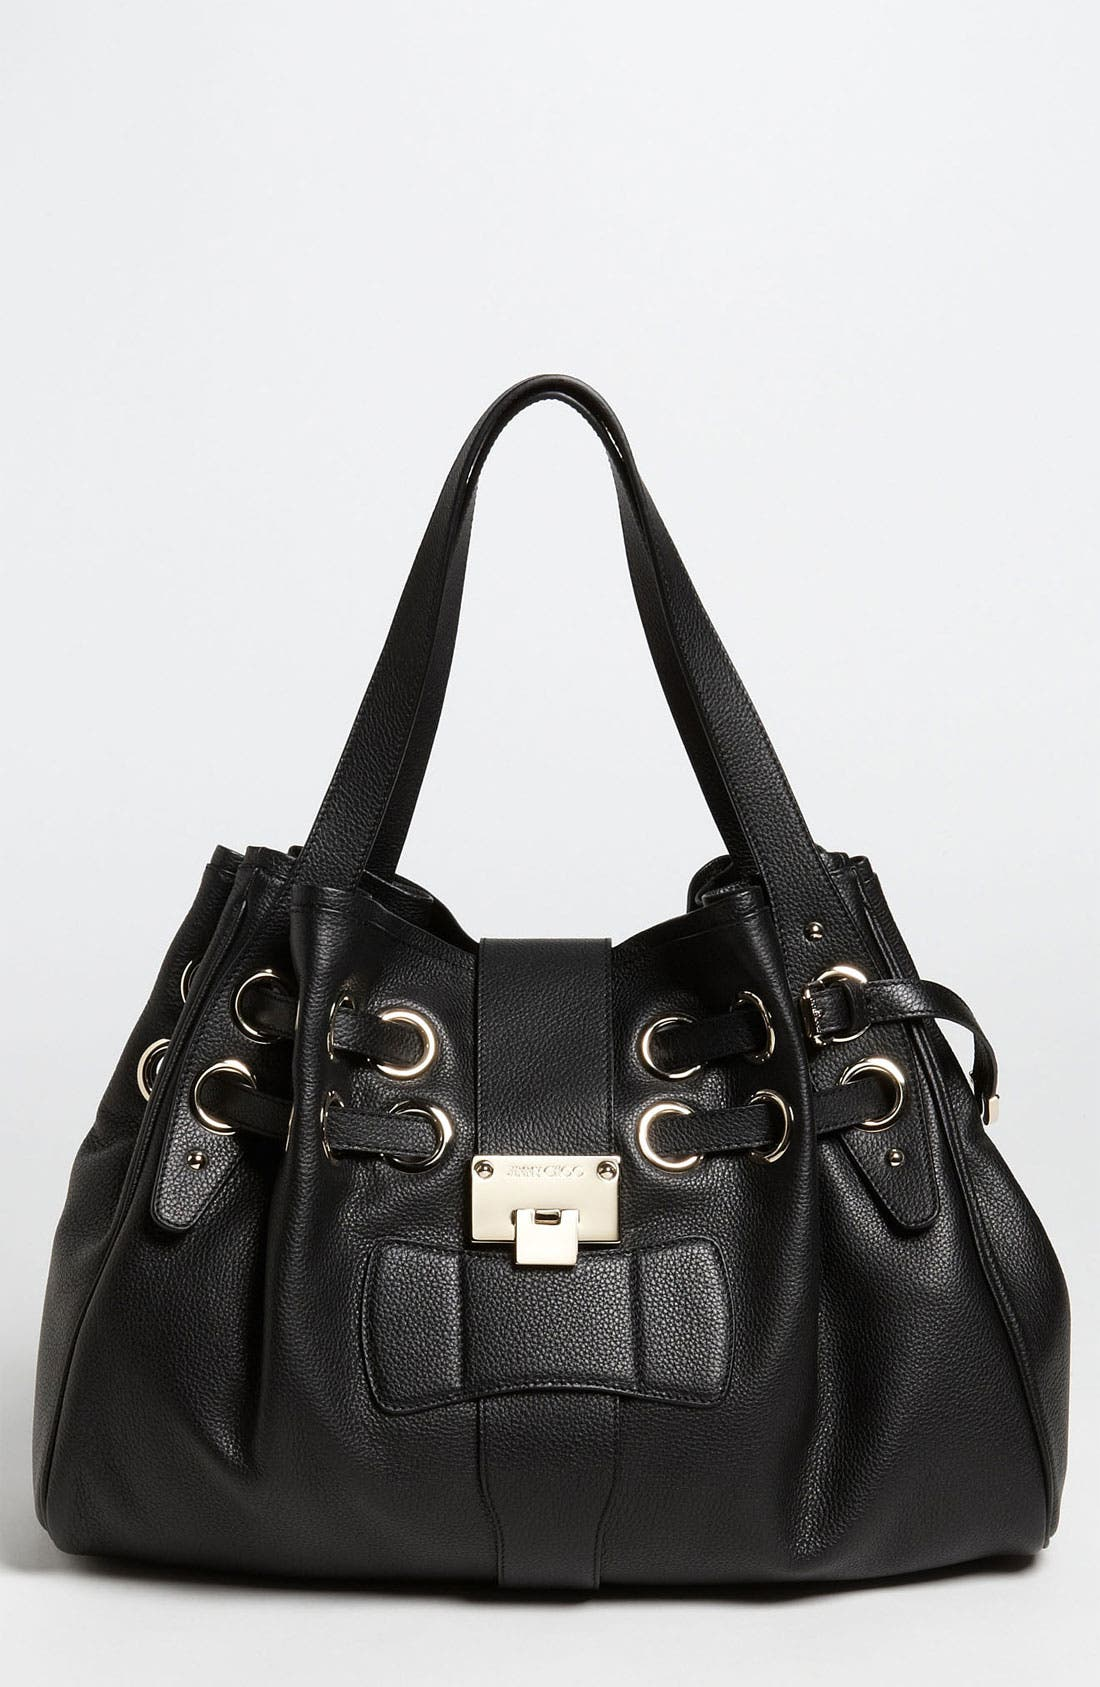 Alternate Image 1 Selected - Jimmy Choo 'Ramona' Leather Shopper